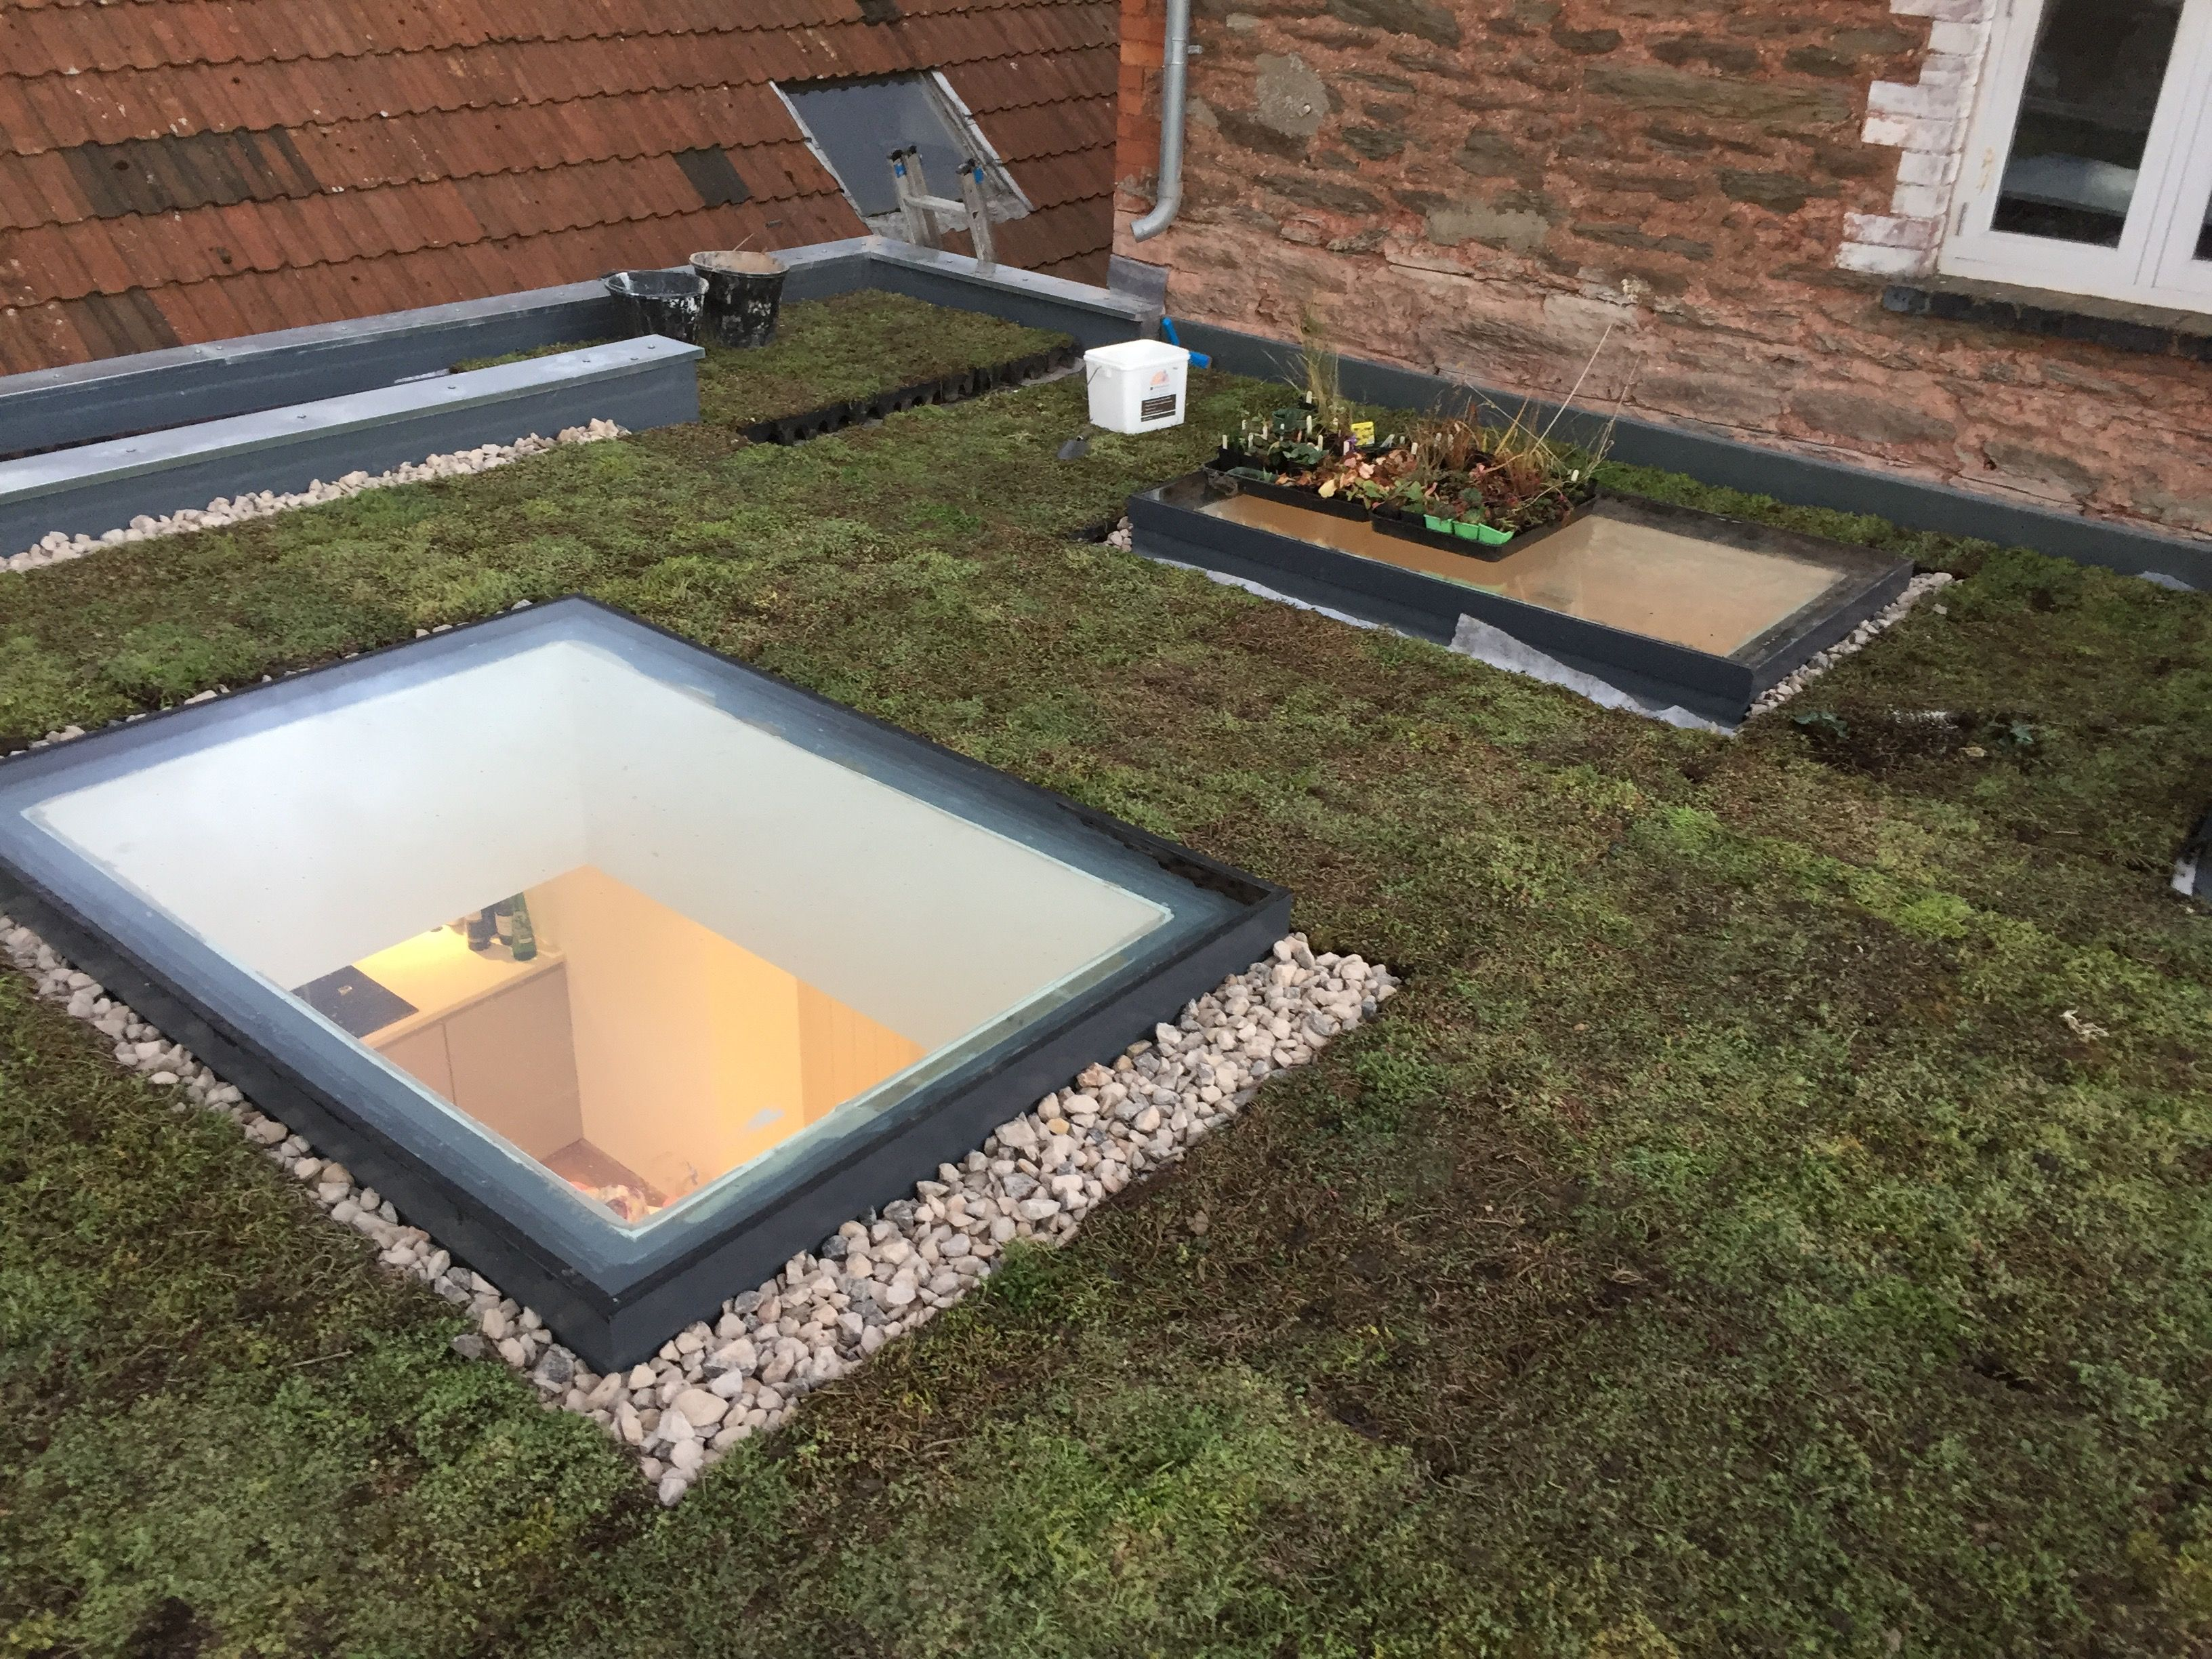 Gruffe Kit Sedum Green Roof Shed Roof Design Green Roof System Roof Design